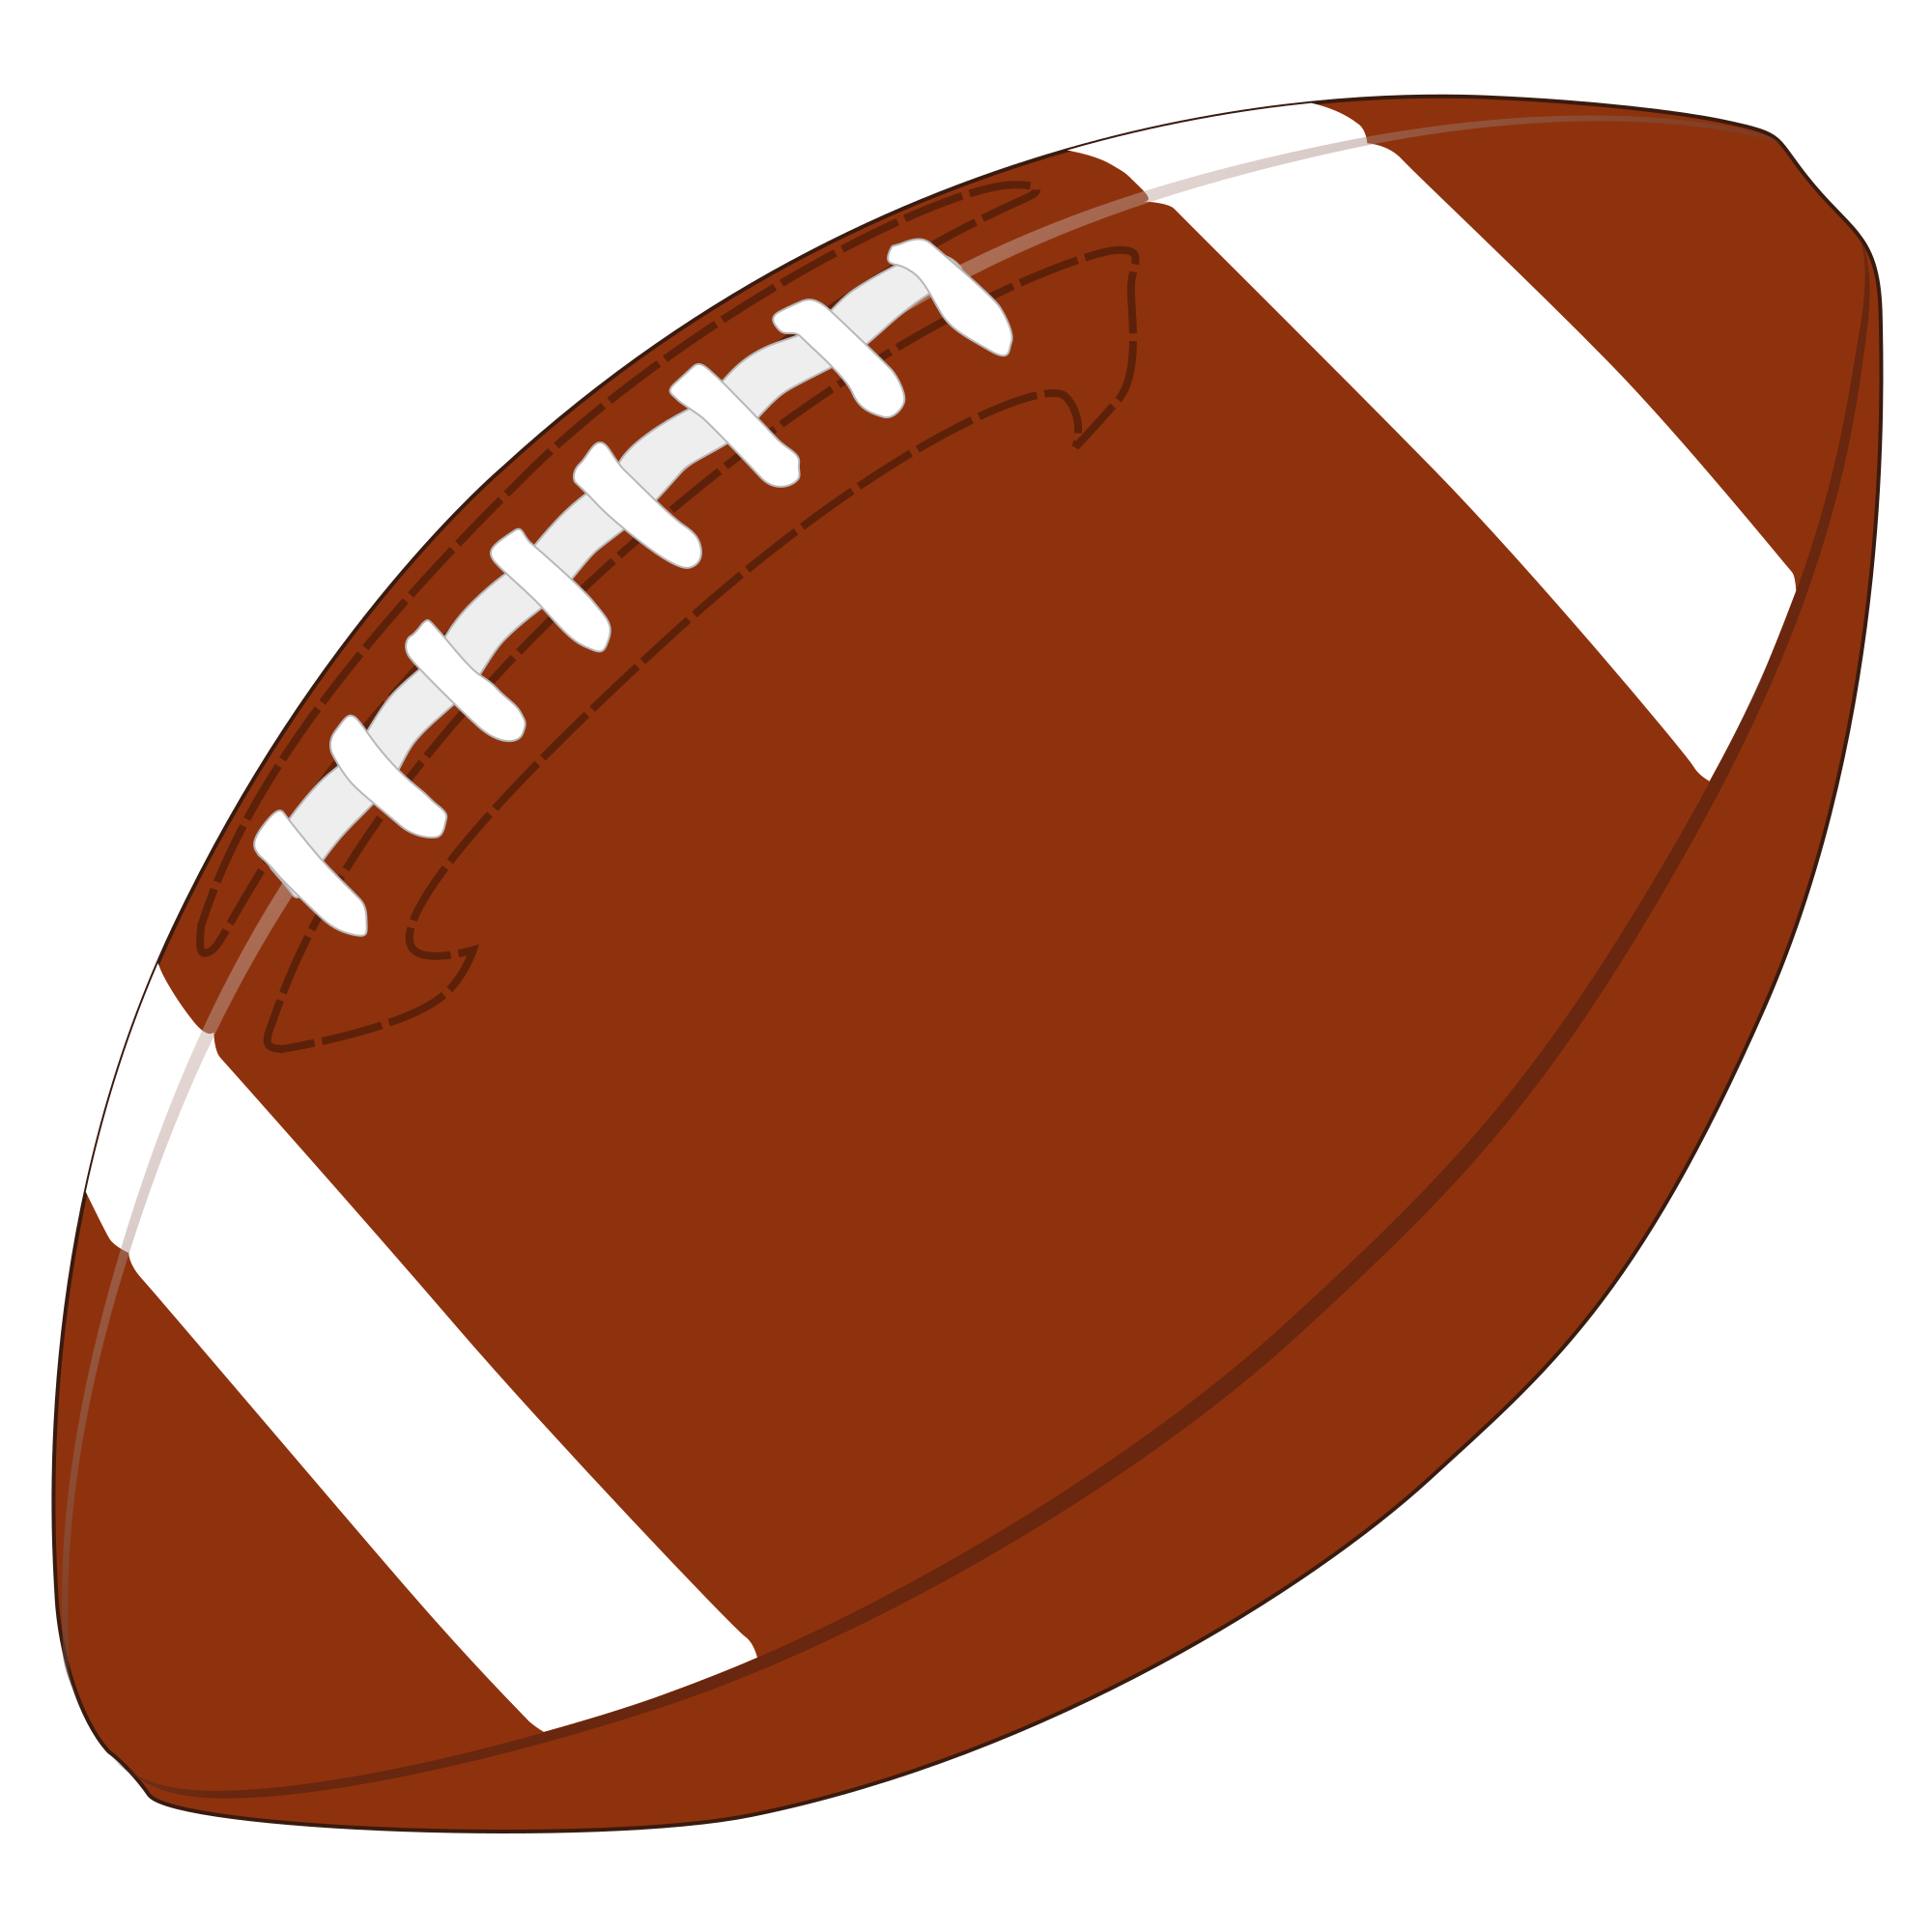 American Football PNG Image